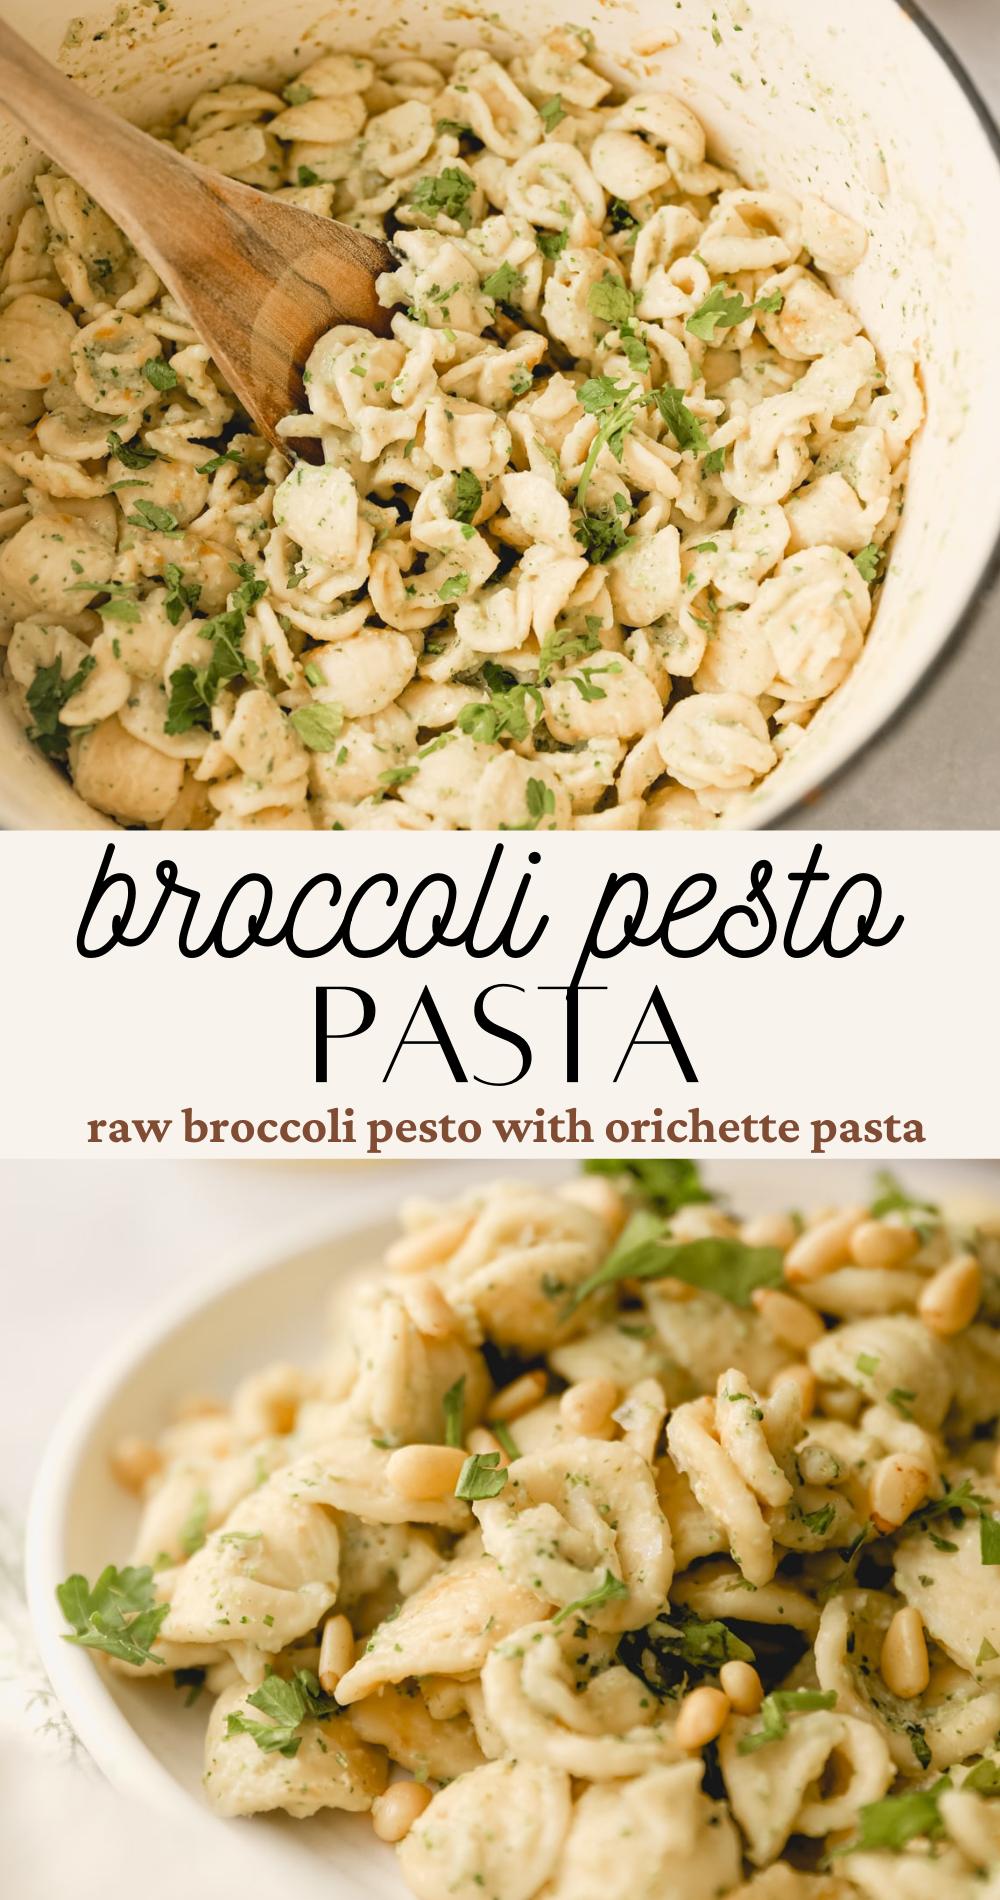 broccoli pesto pasta pin